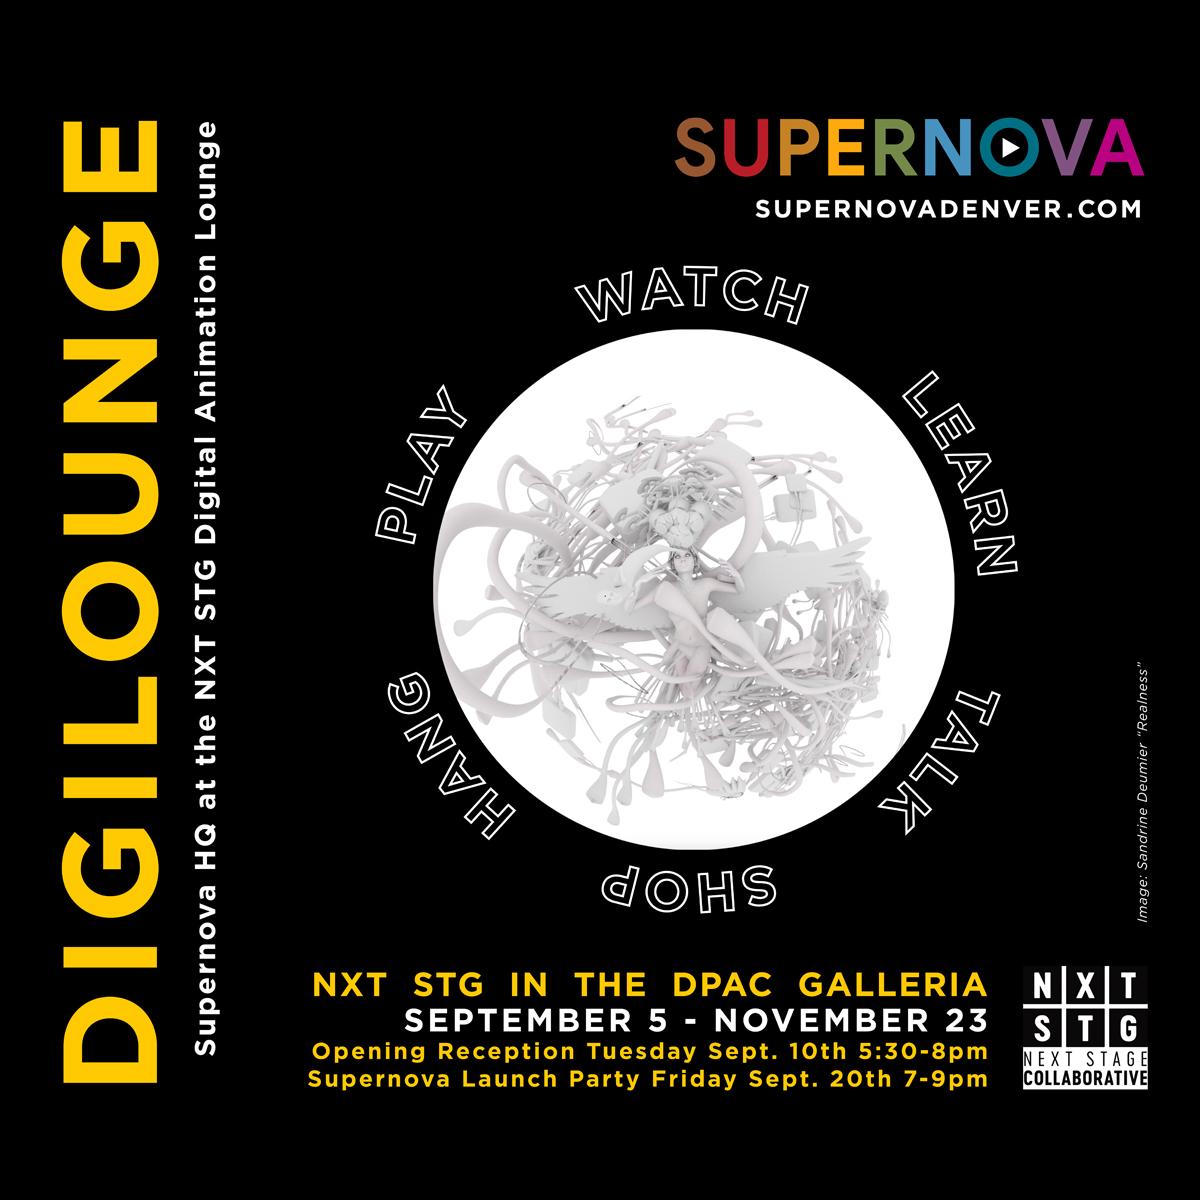 Supernova DigiLounge_NxtStg.jpg